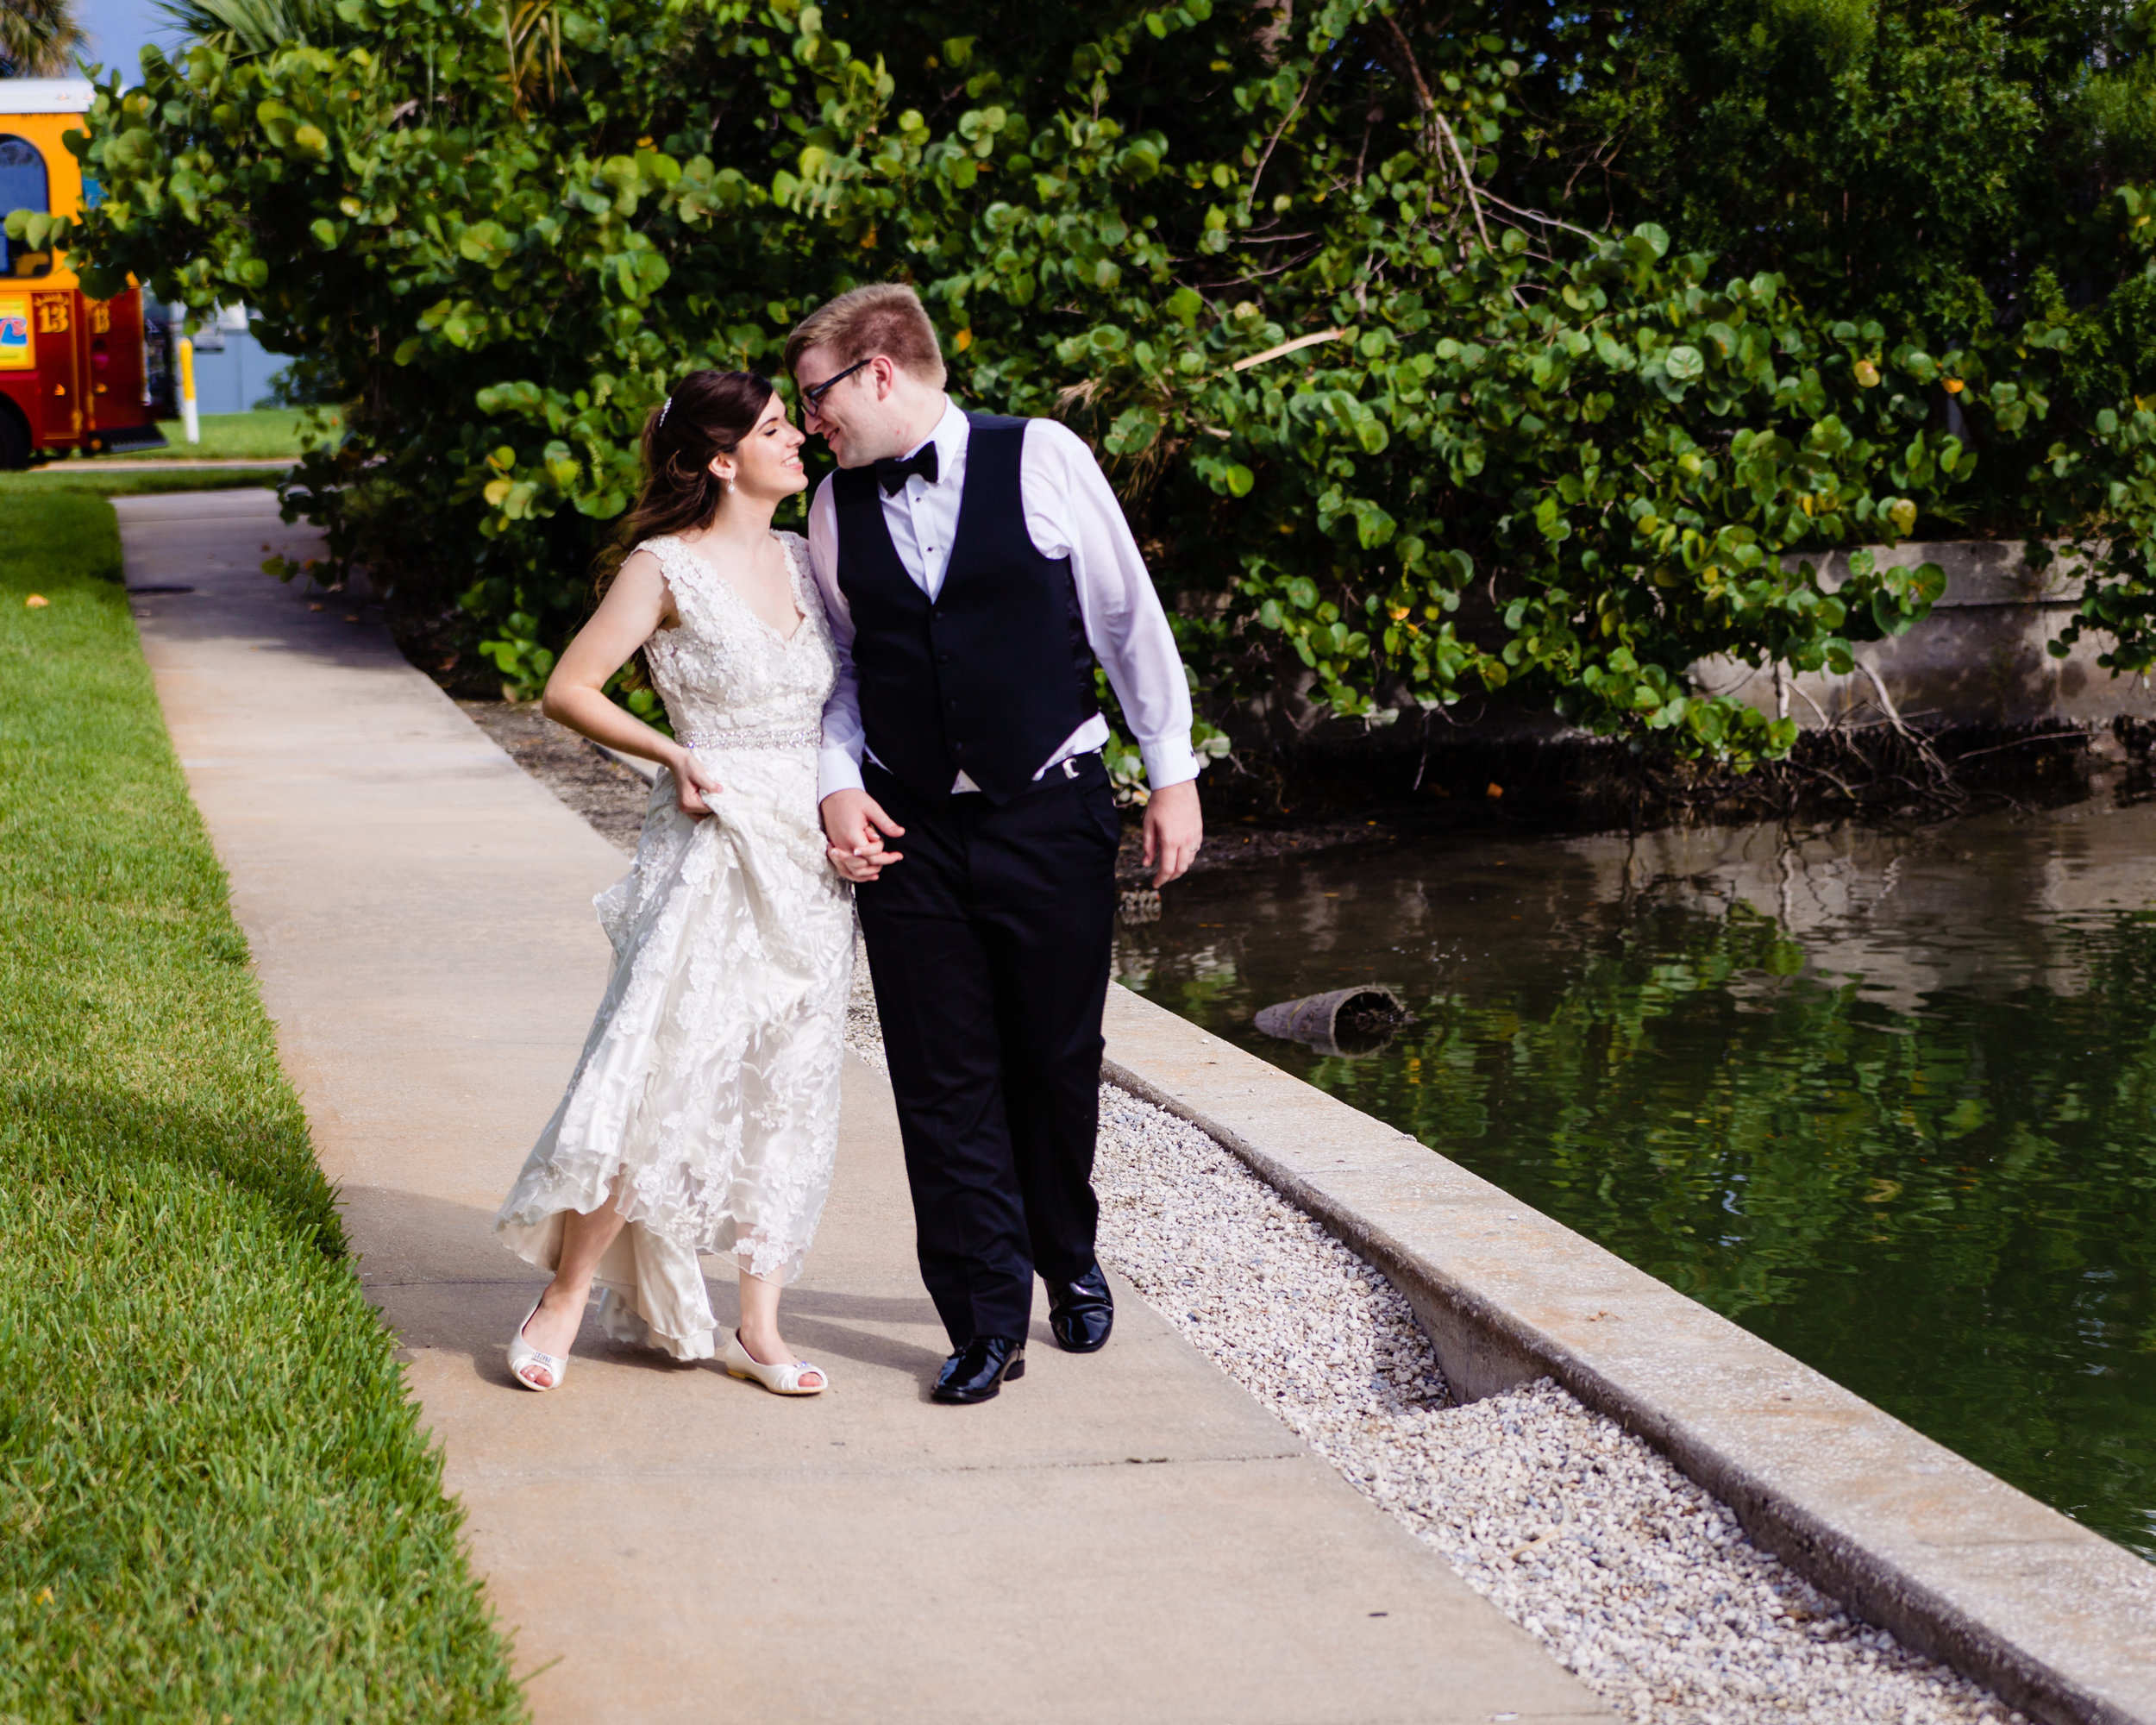 HAH_Zoe and Daniel_Clearwater Wedding_620_2018.jpg